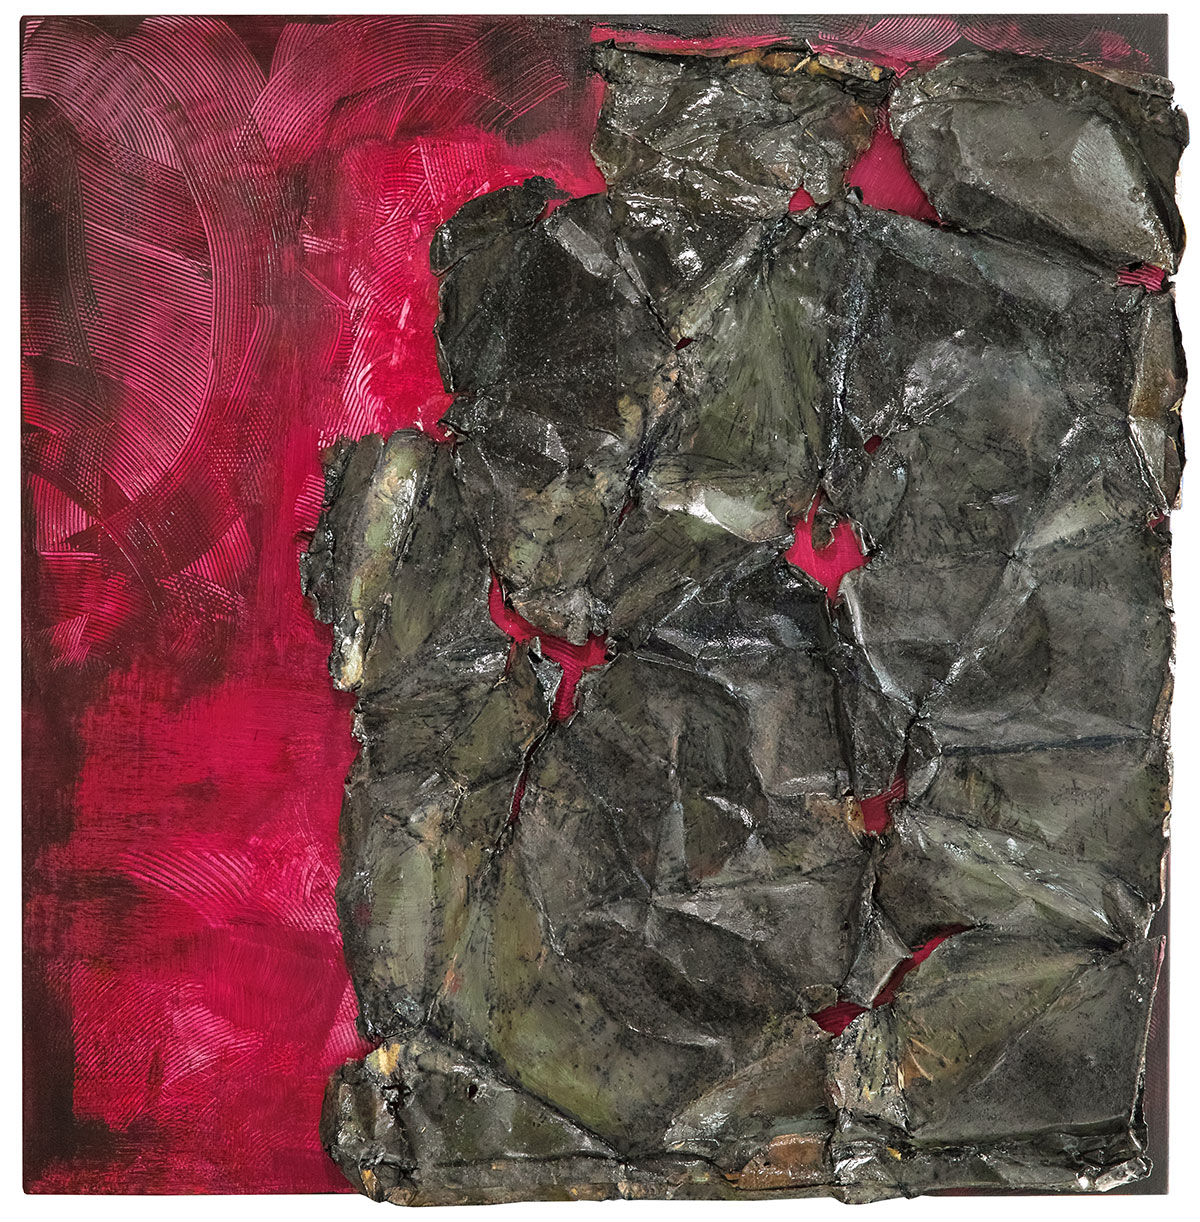 Ardente (2020), tecnica mista su tela, cm. 100x100